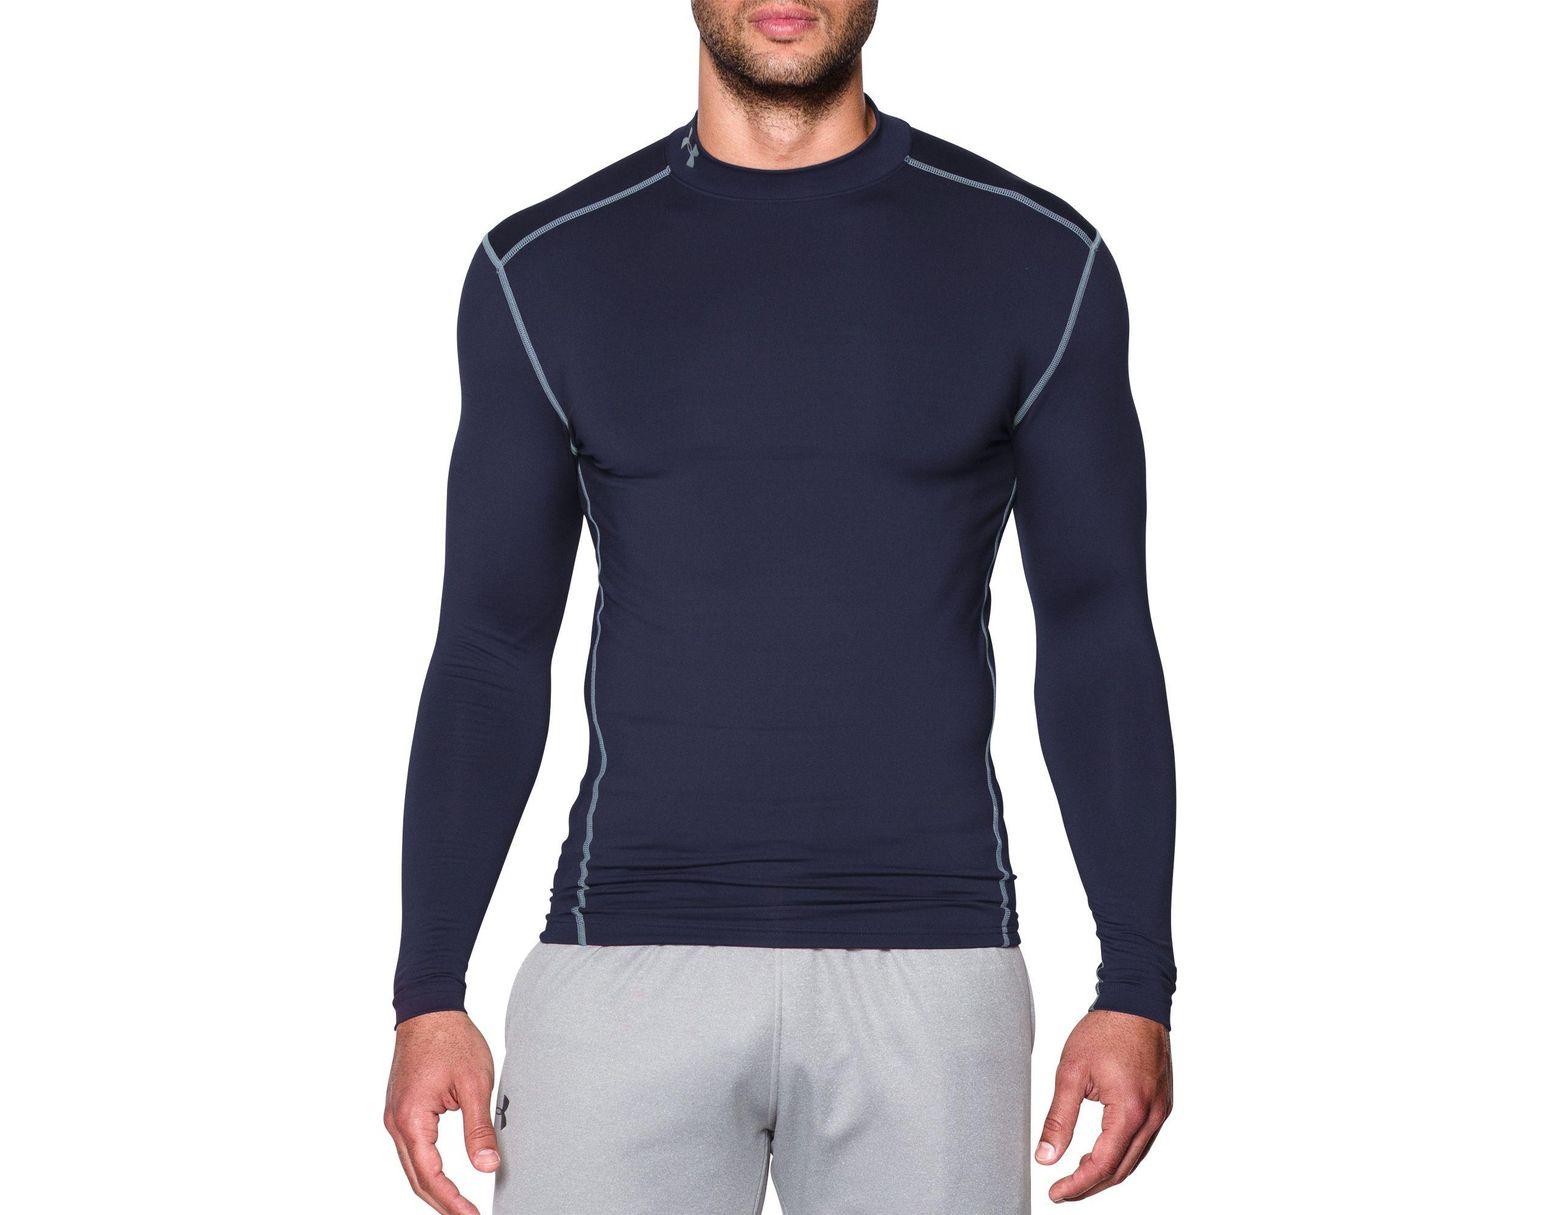 7c58d78e8 Under Armour Coldgear Armour Compression Mock Neck Long Sleeve Shirt in  Blue for Men - Lyst